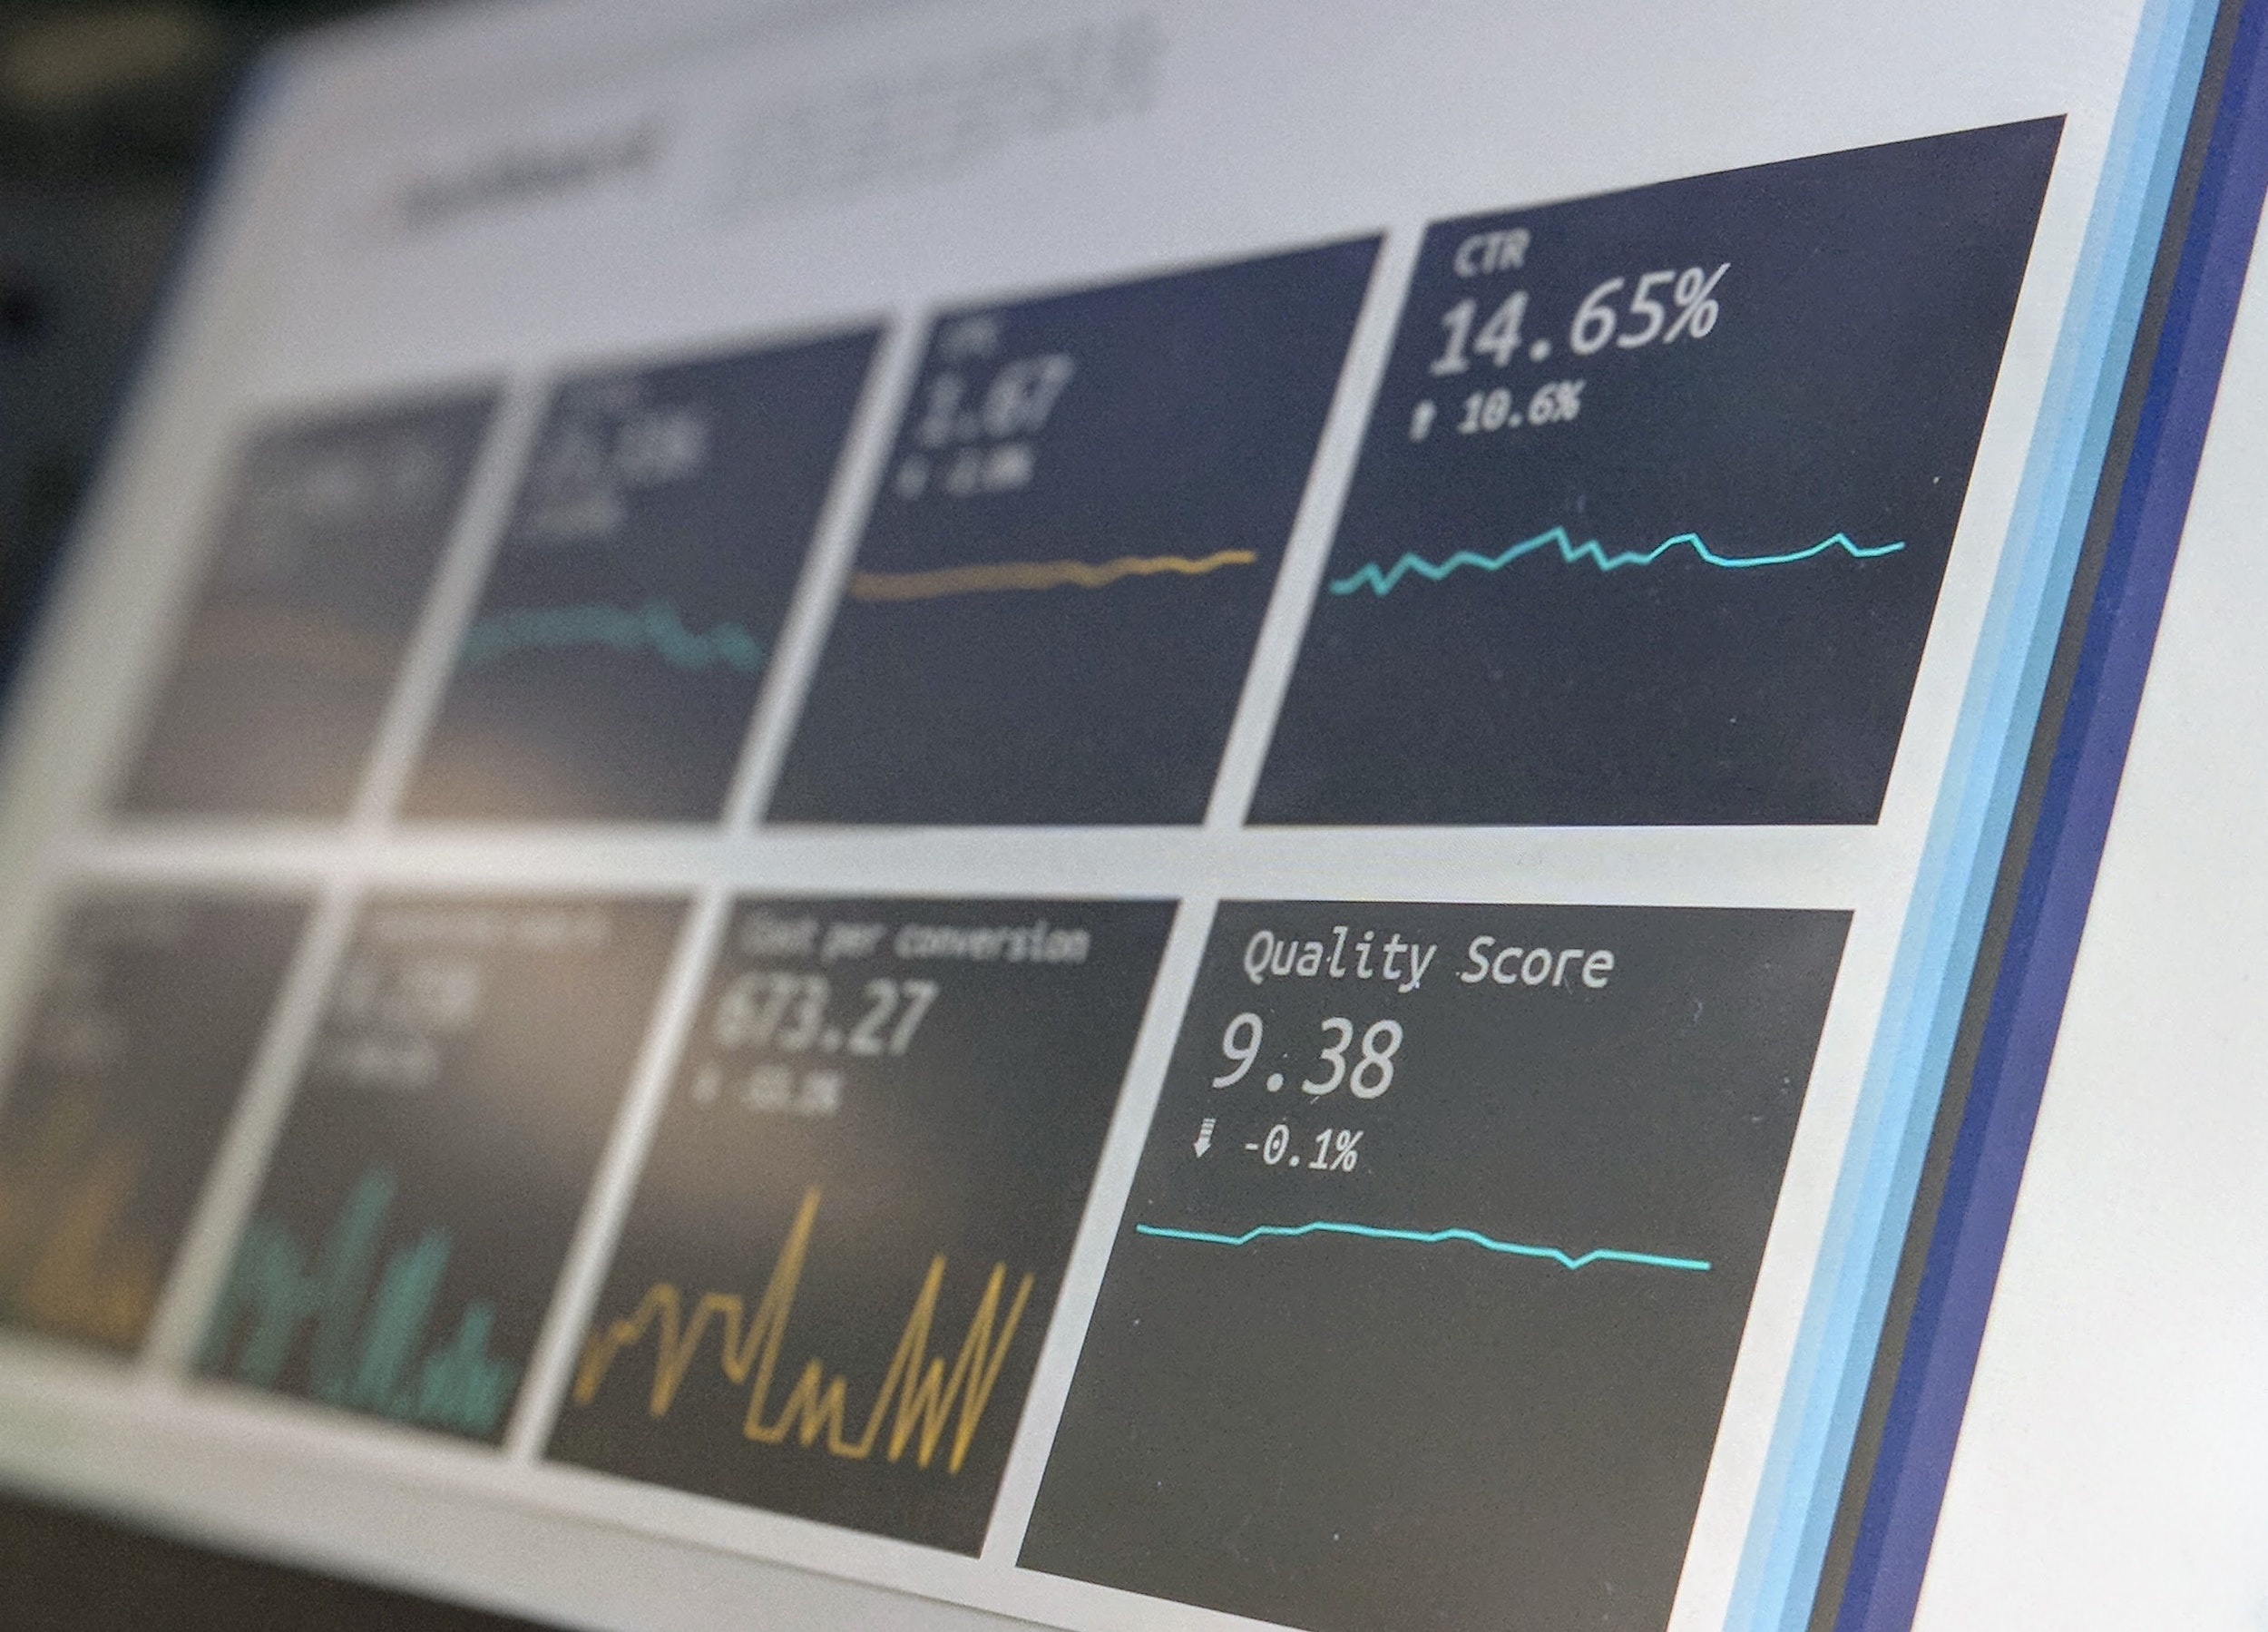 mlops data science machine learning deep learning data ia